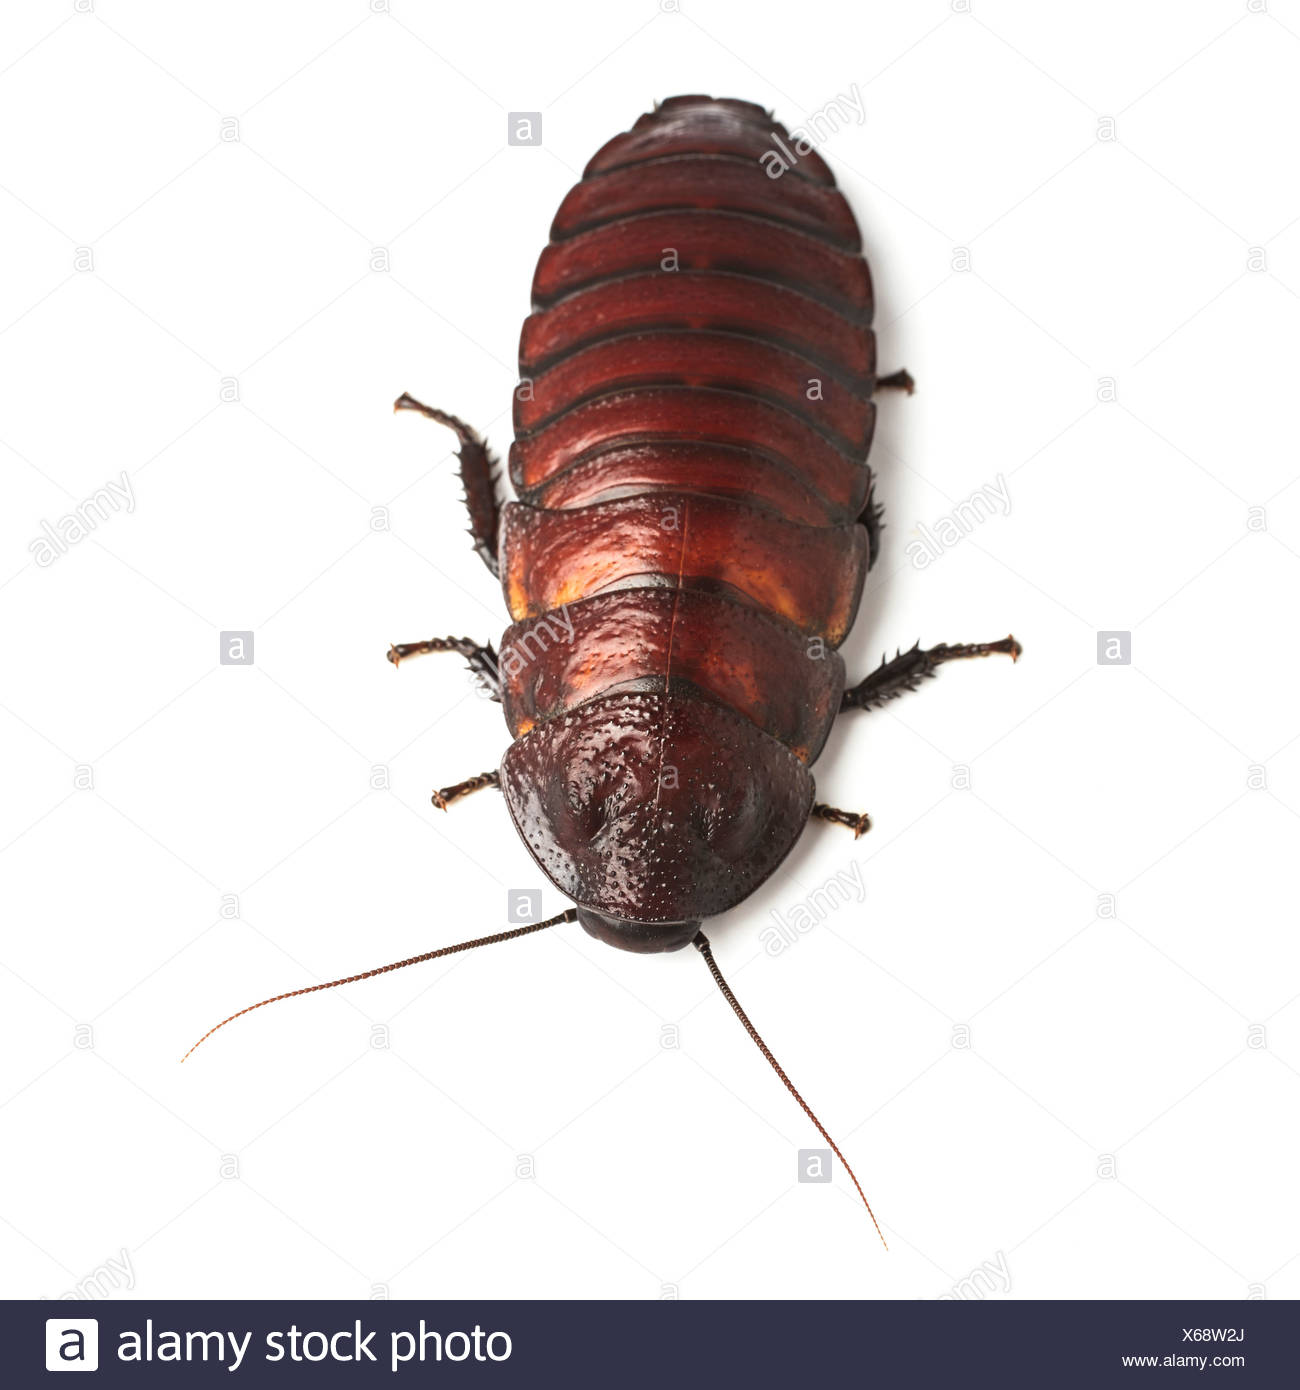 Cockroach Stock Photos & Cockroach Stock Images - Alamy